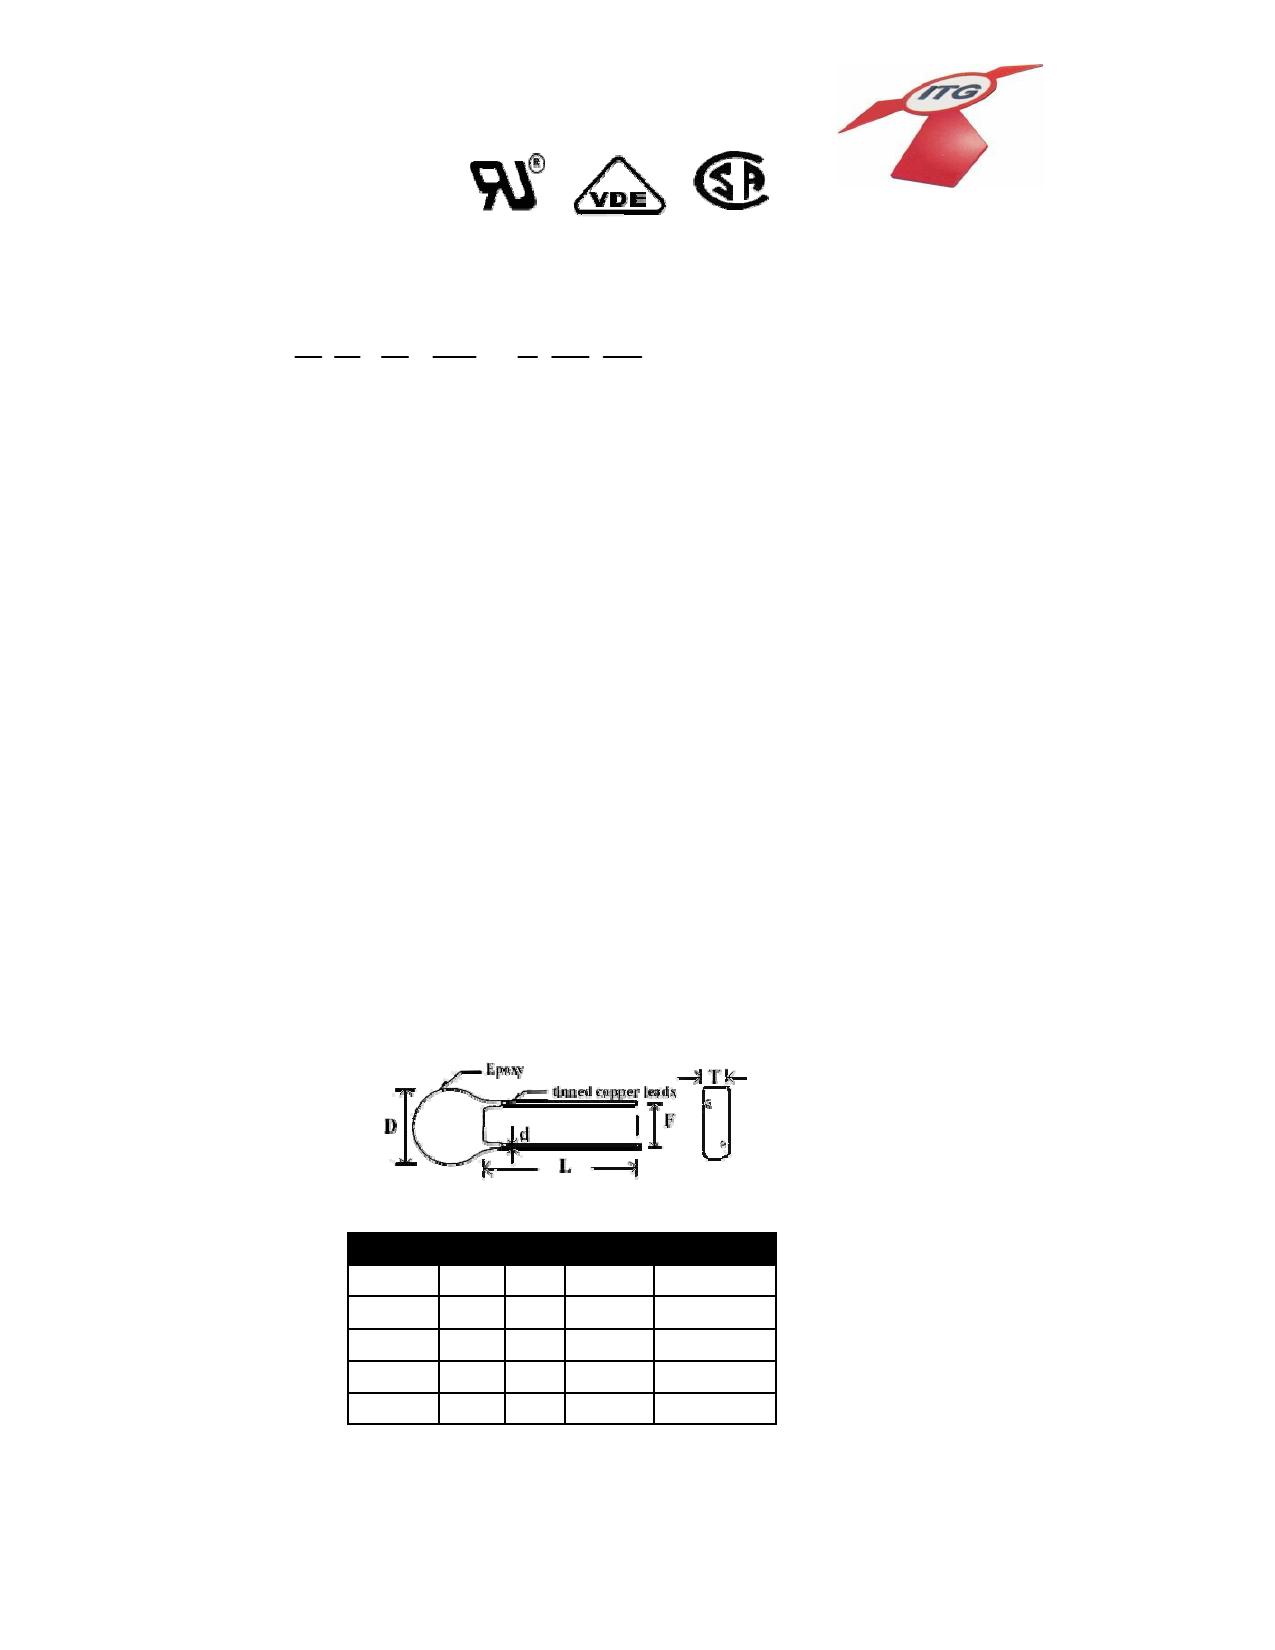 V05K11-5 datasheet